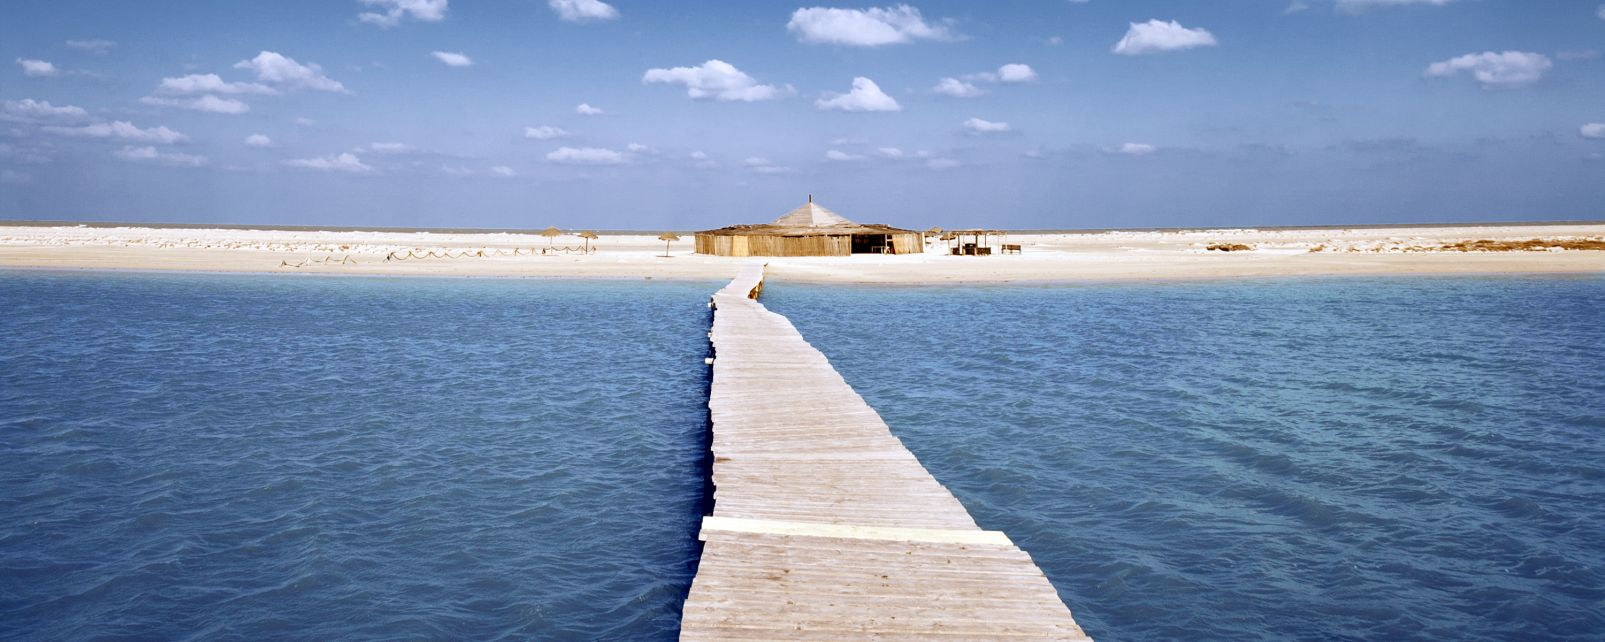 Djerba, Tunesien,